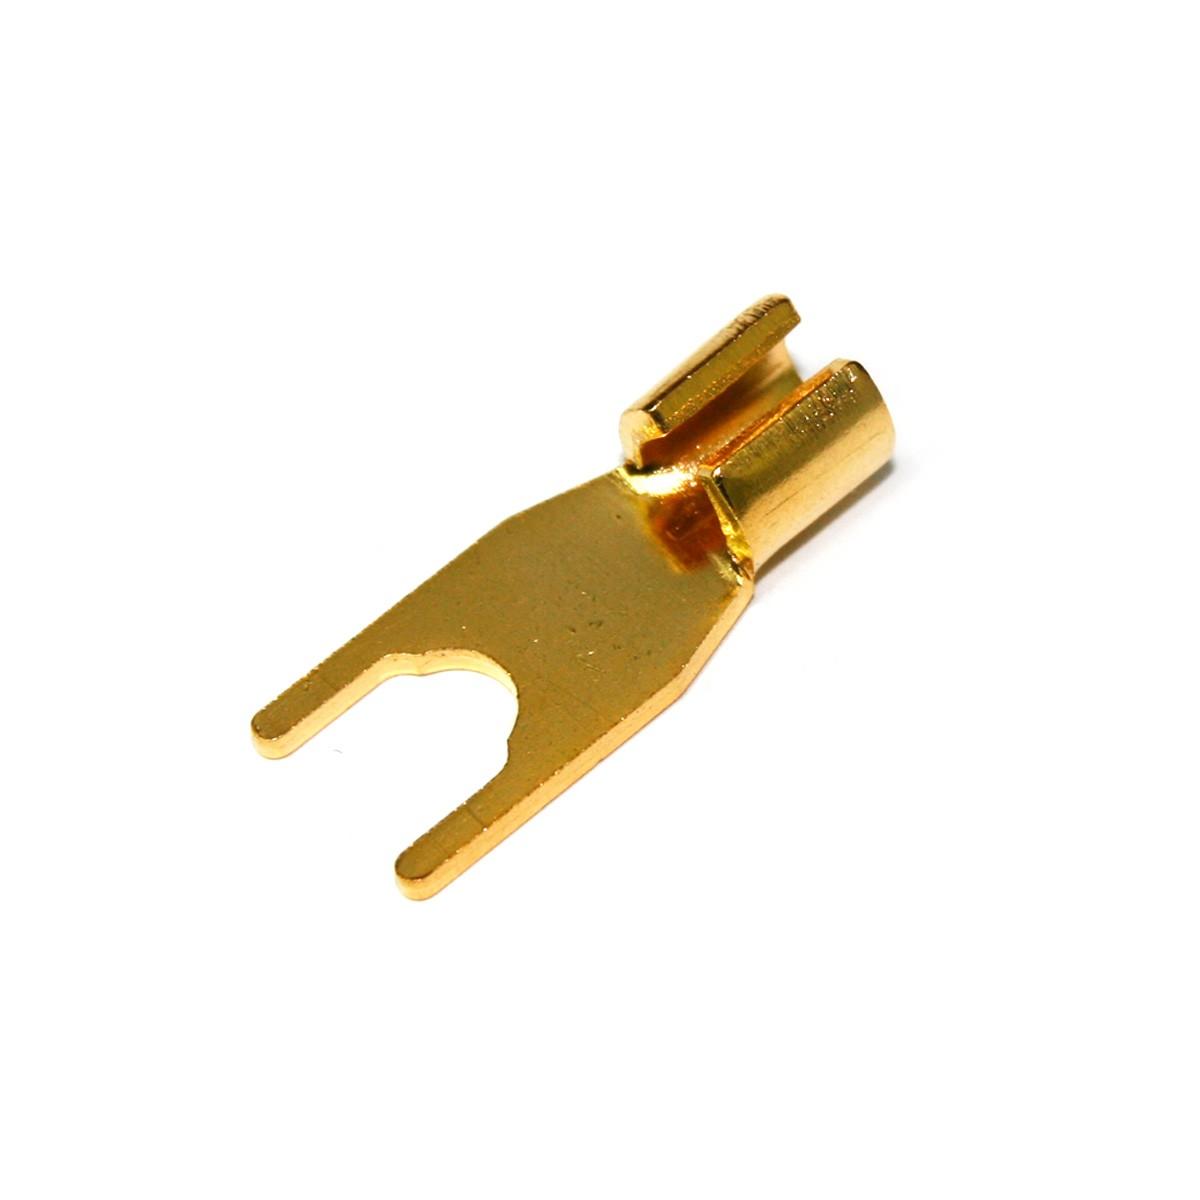 ELECAUDIO FC-104 24K Gold Plated Pure Copper Flat Spade Ø5.8mm (Unité)